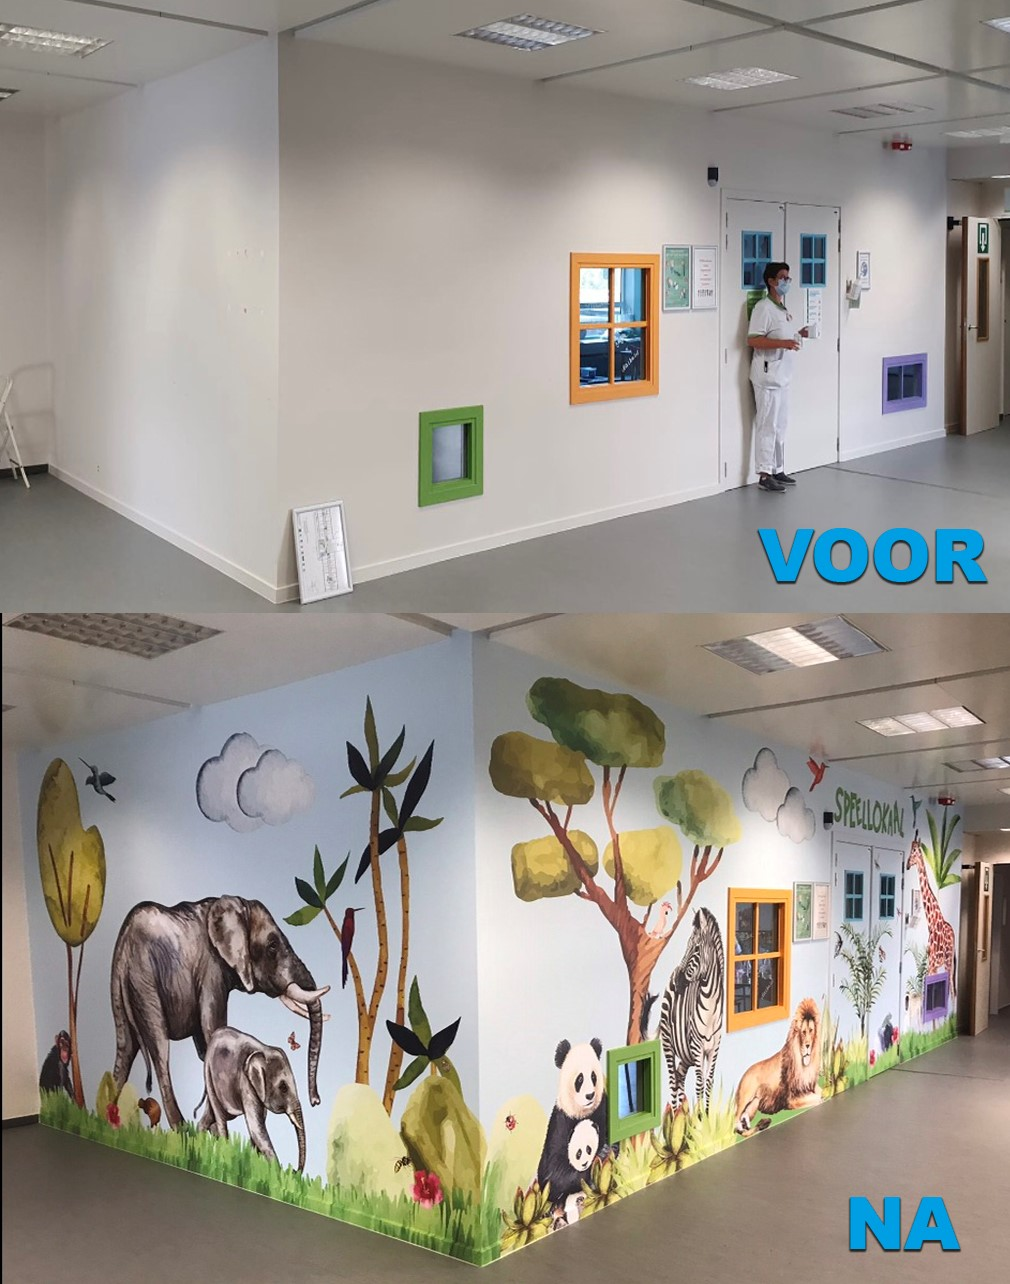 Koningin Paola Kinderziekenhuis | Jungle